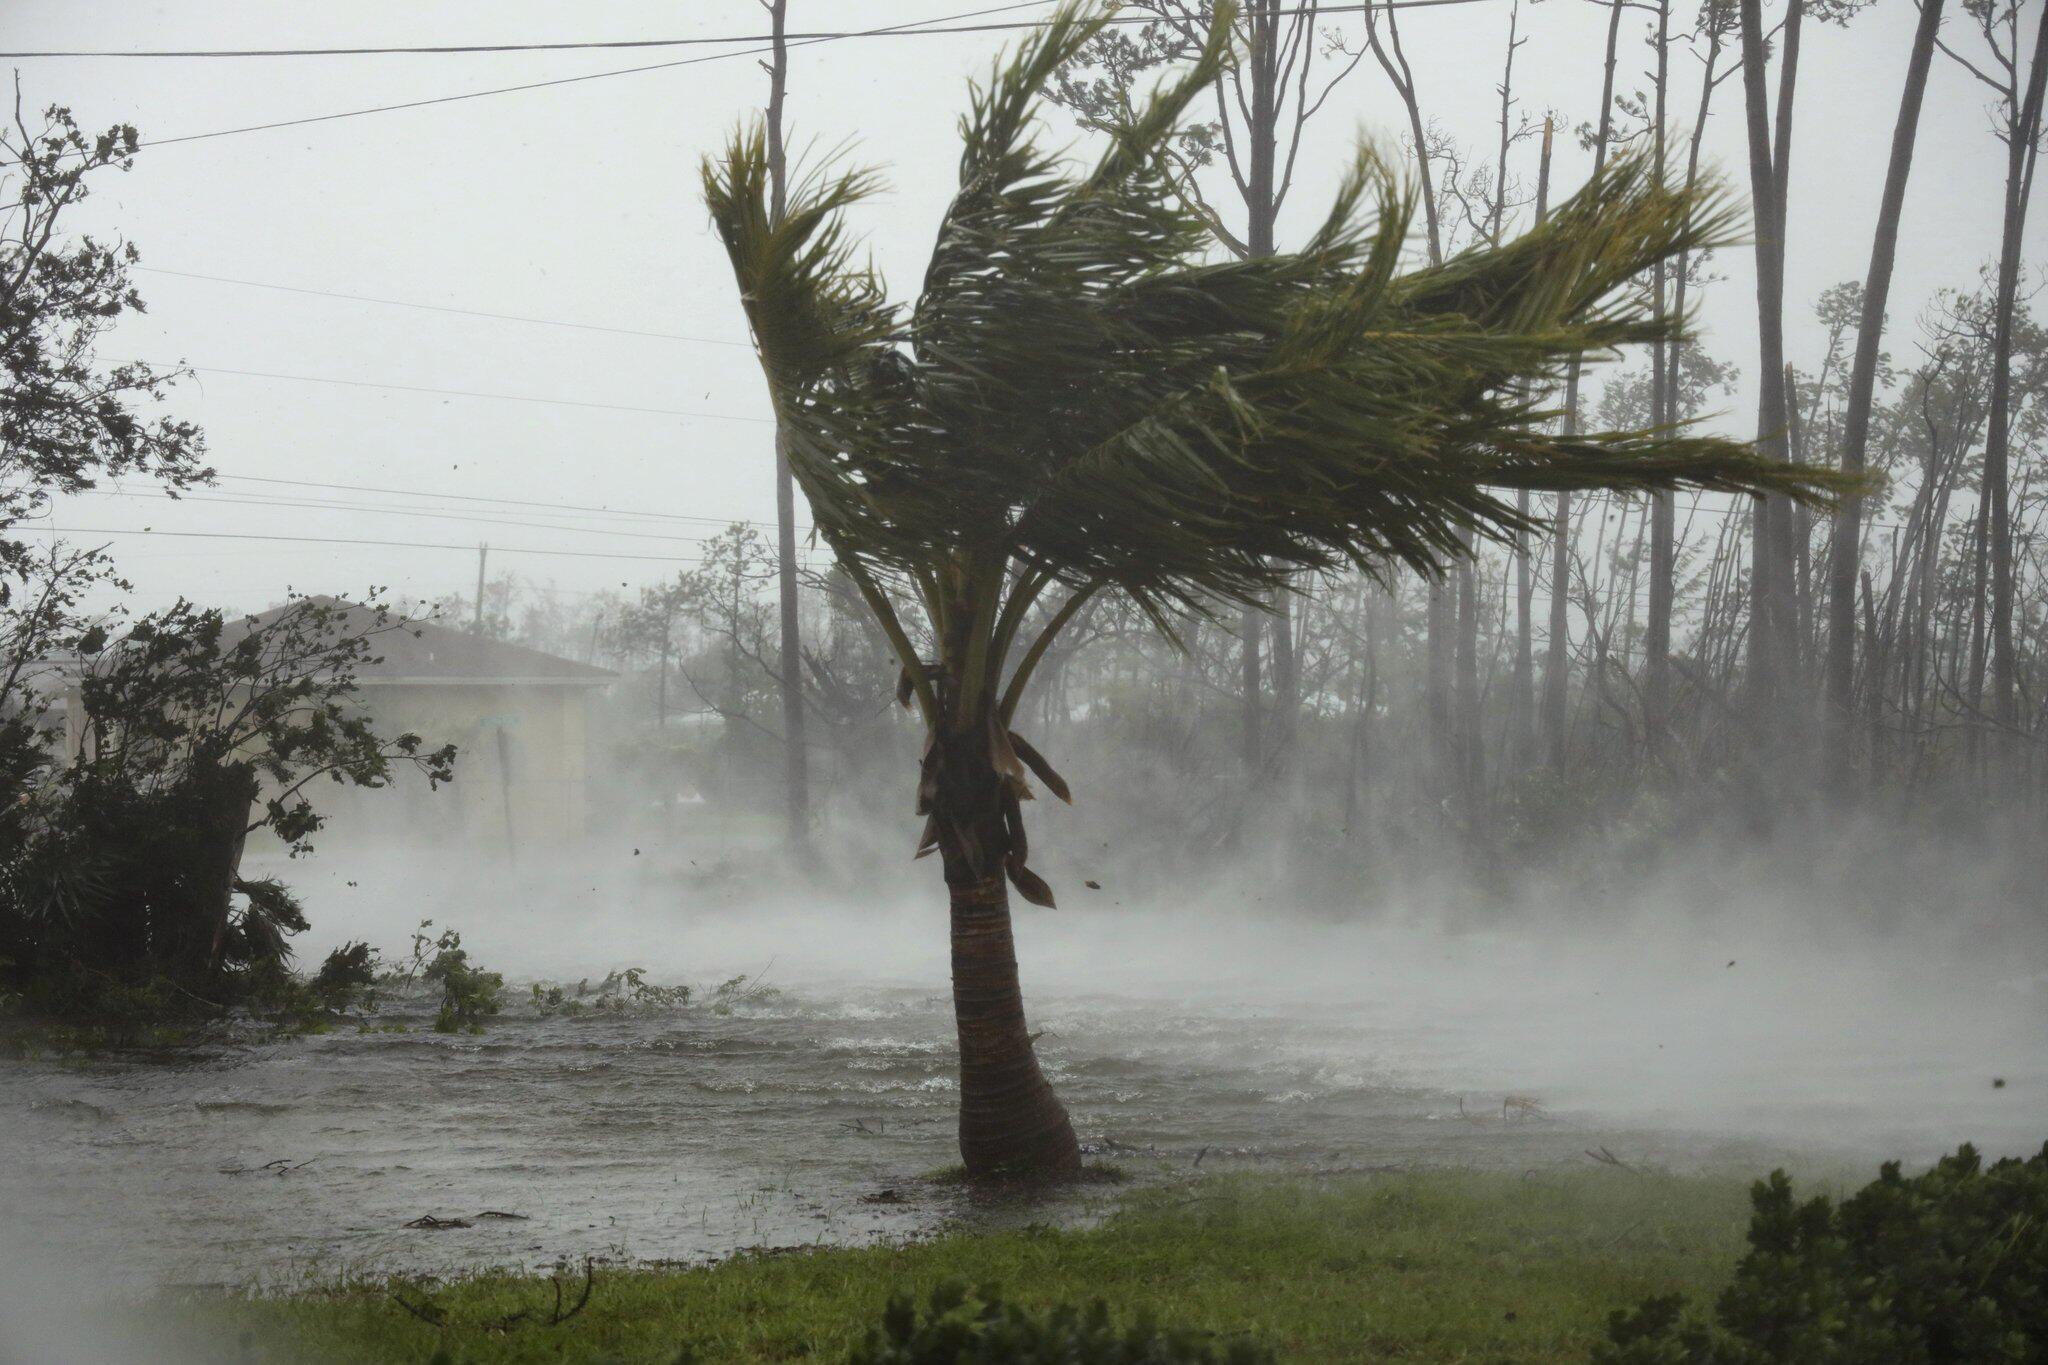 Bild zu Hurrikan, Dorian, Bahamas